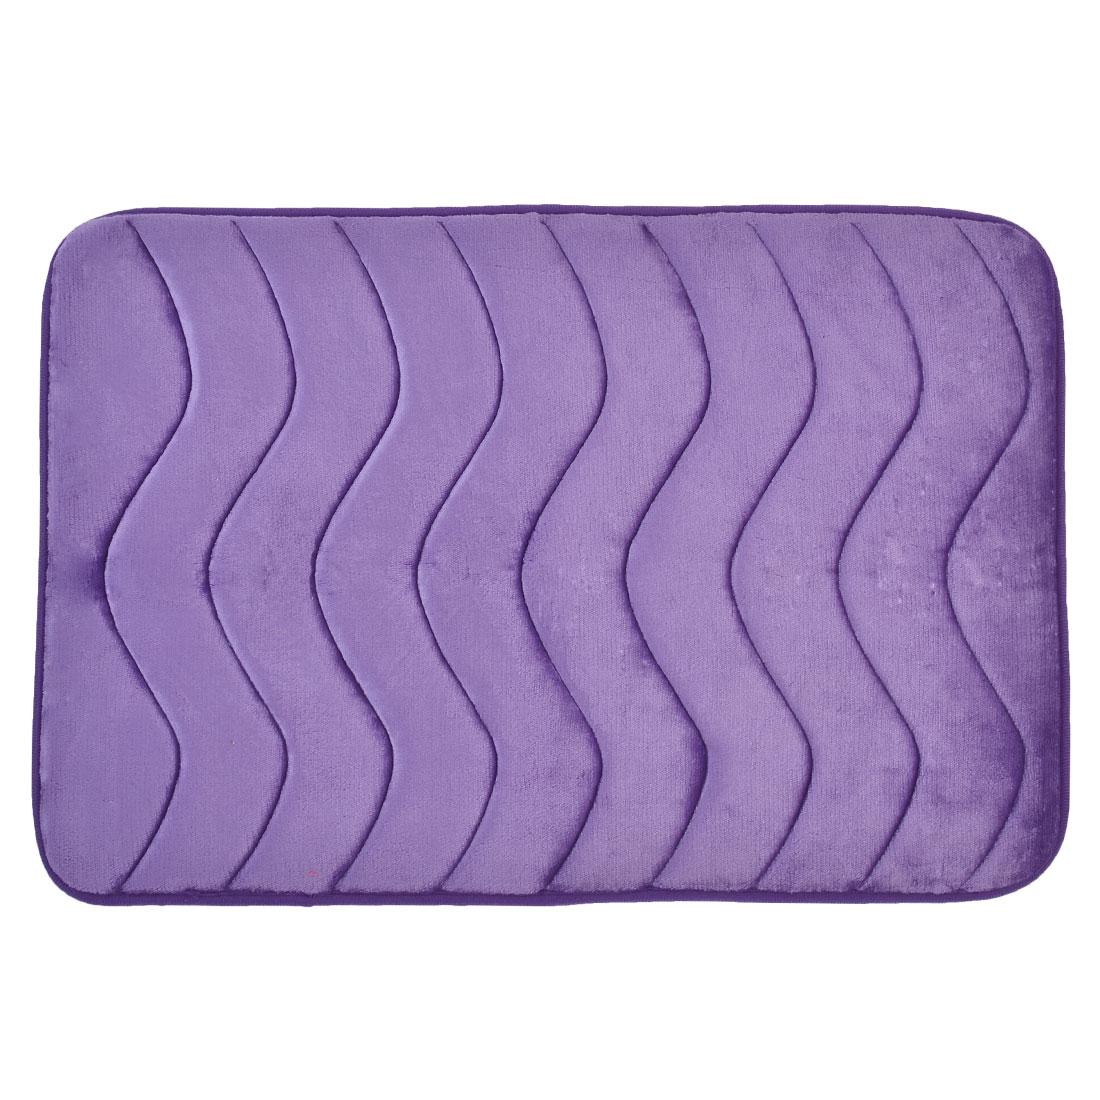 58cm x 40cm Light Purple Villus Surface Wavy Pattern Absorbent Non-slip Pad Shower Rug